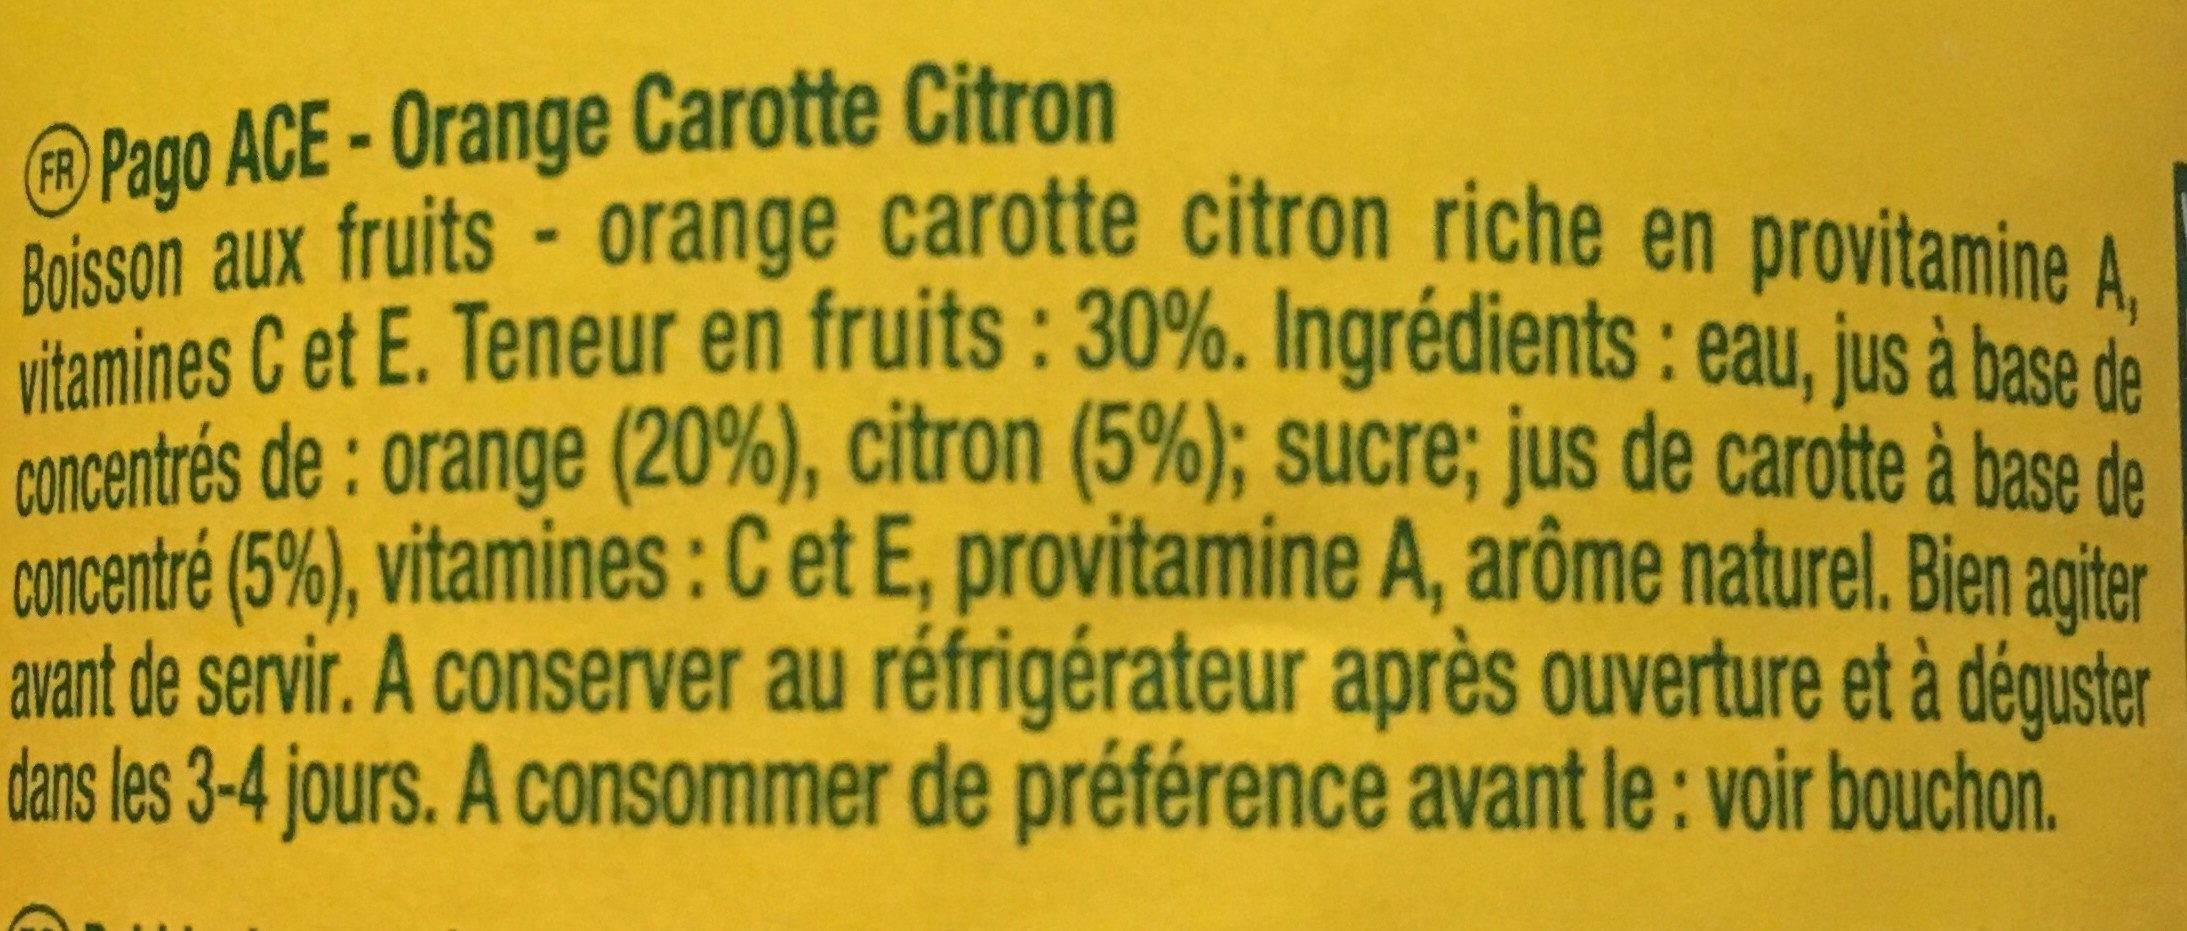 Pago Orange Carotte Citron - Ingredients